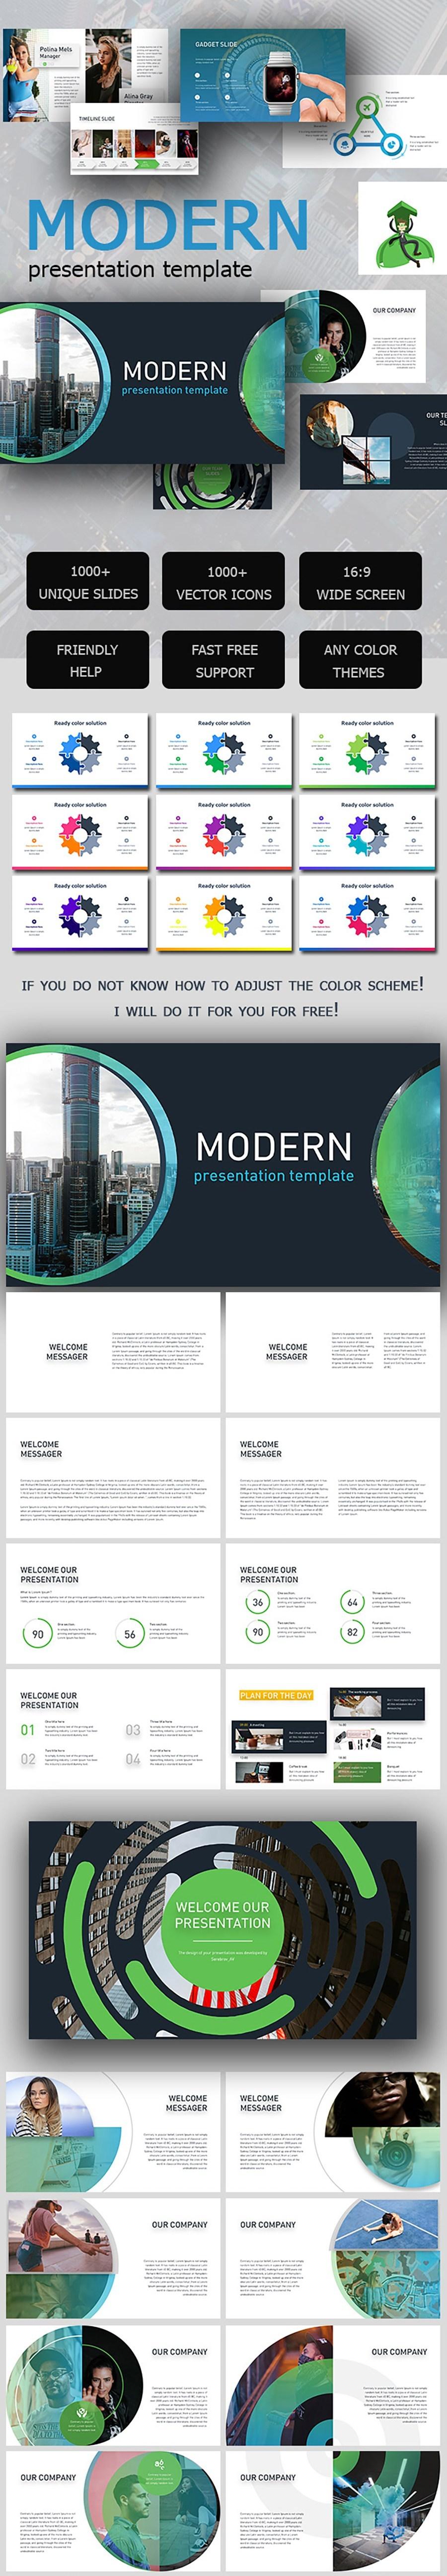 Free Modern Presentation Template